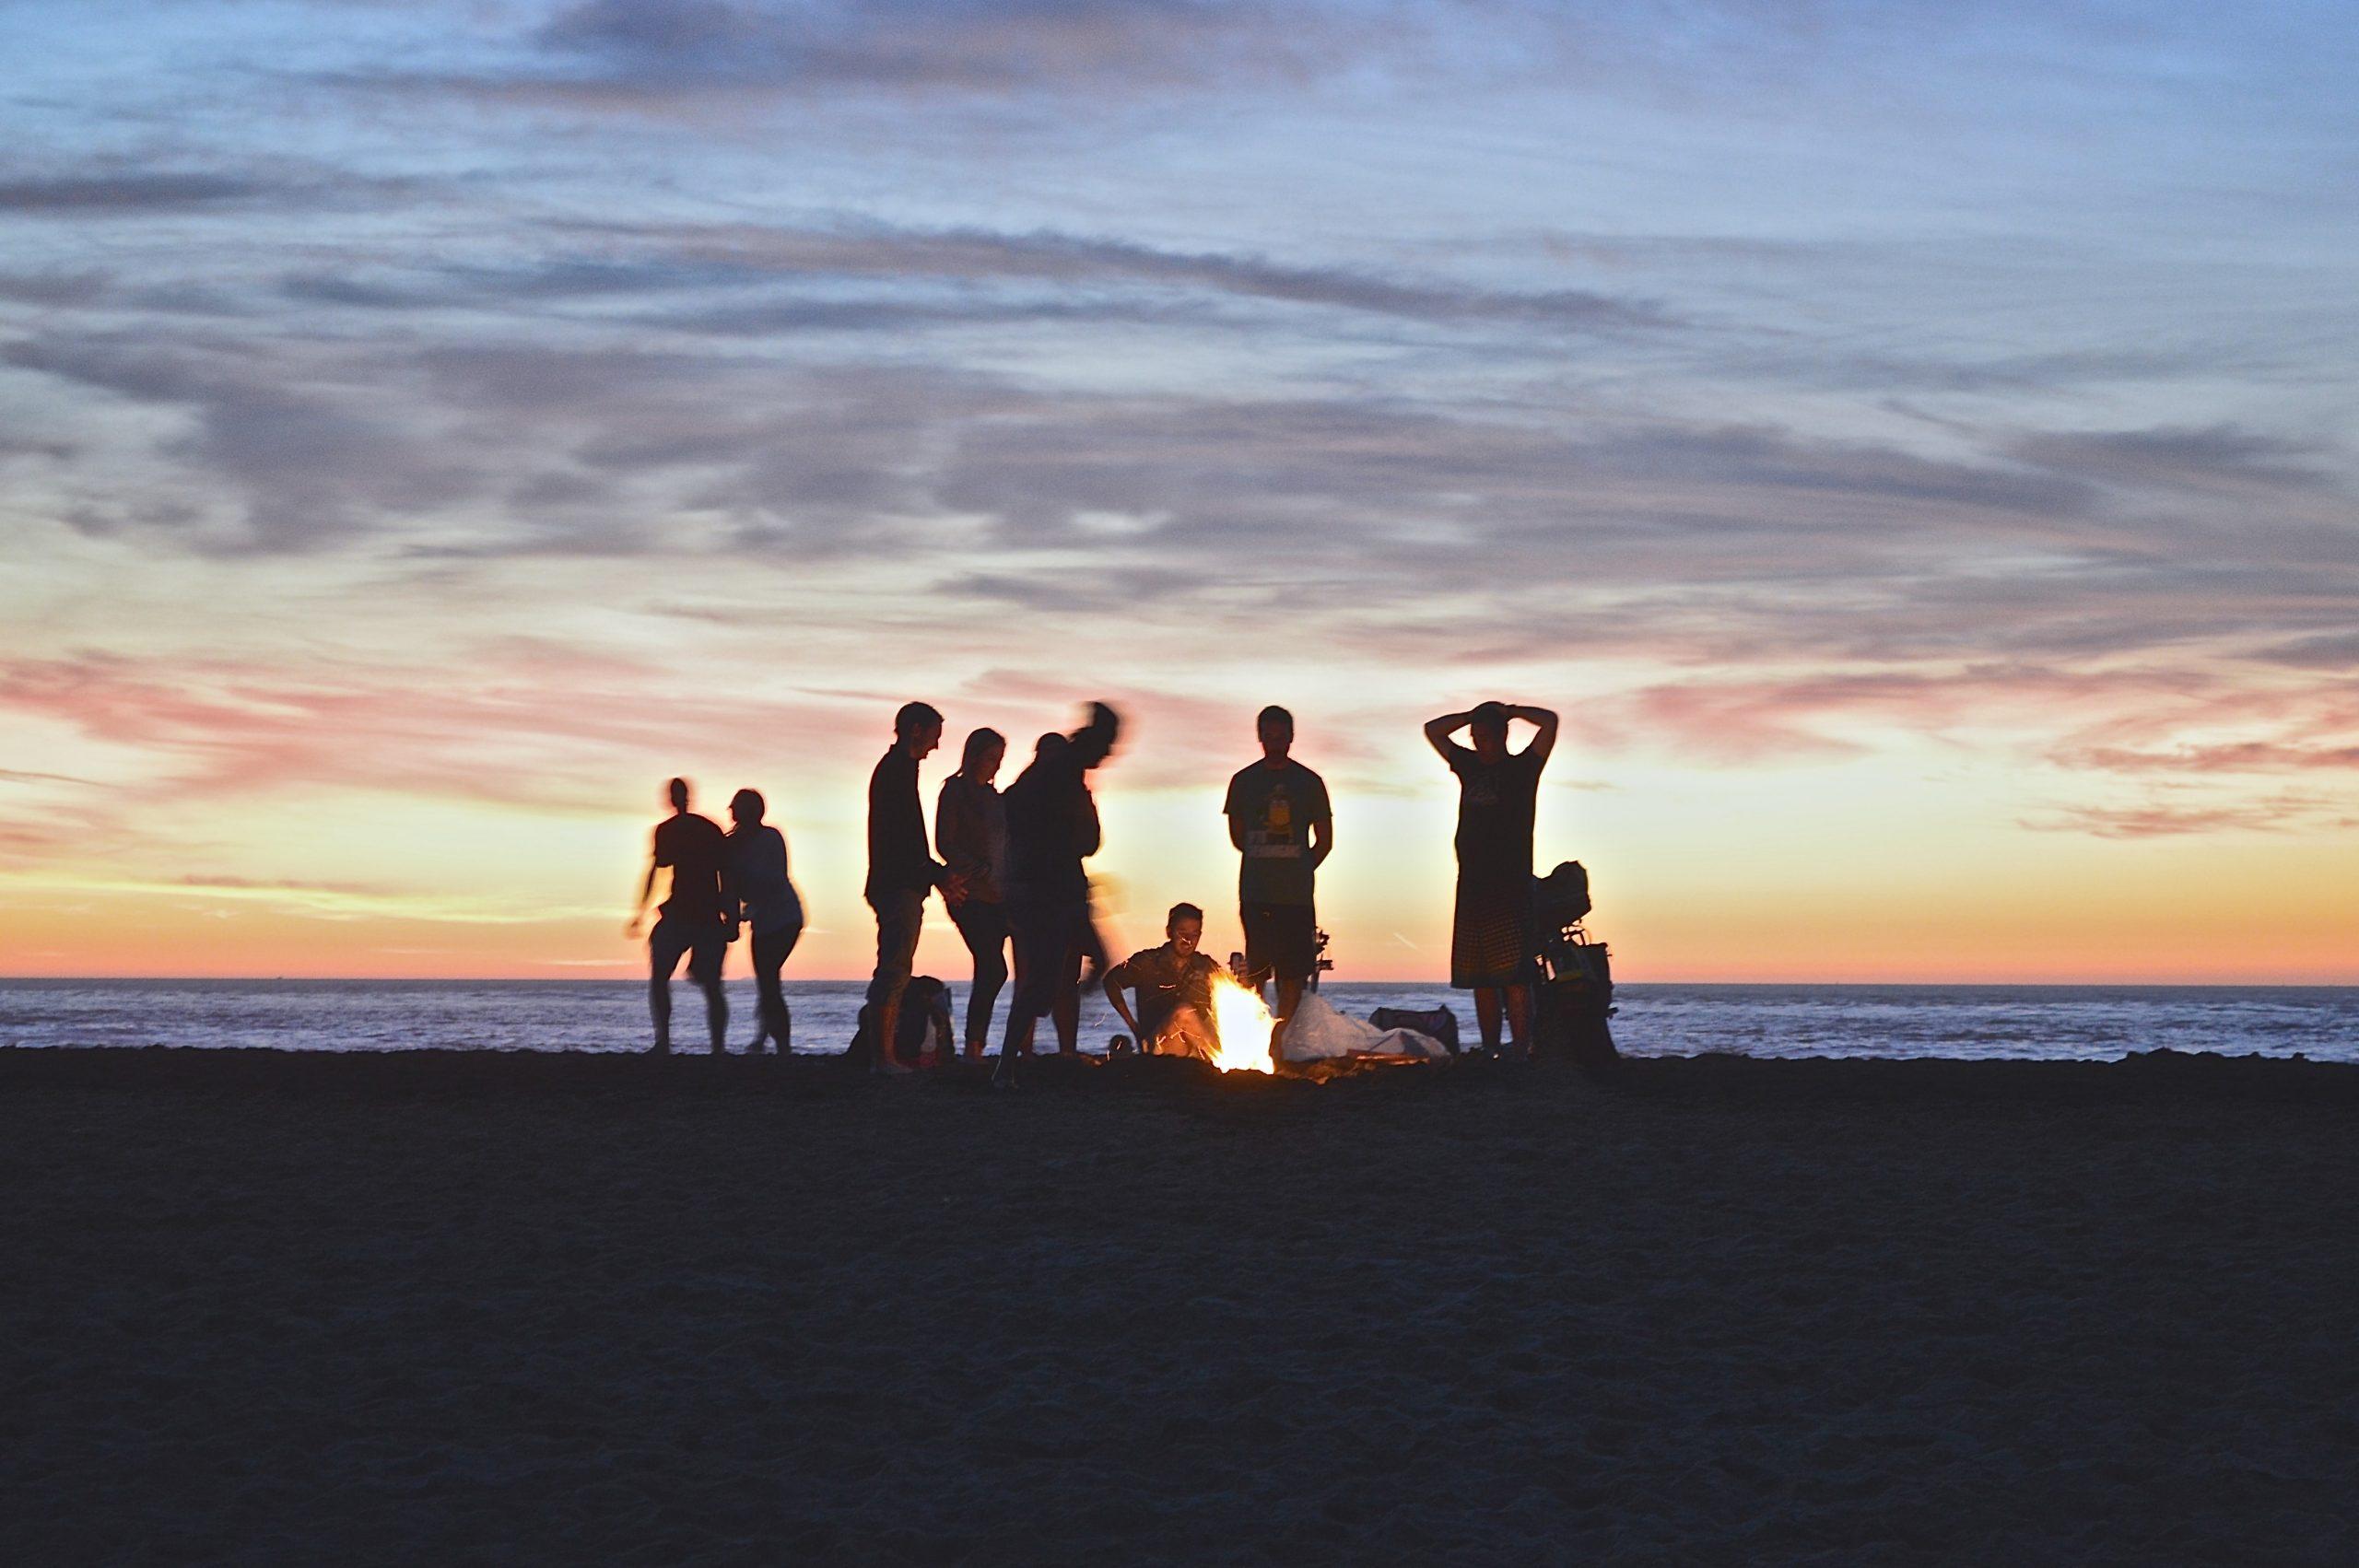 santa cruz beach party